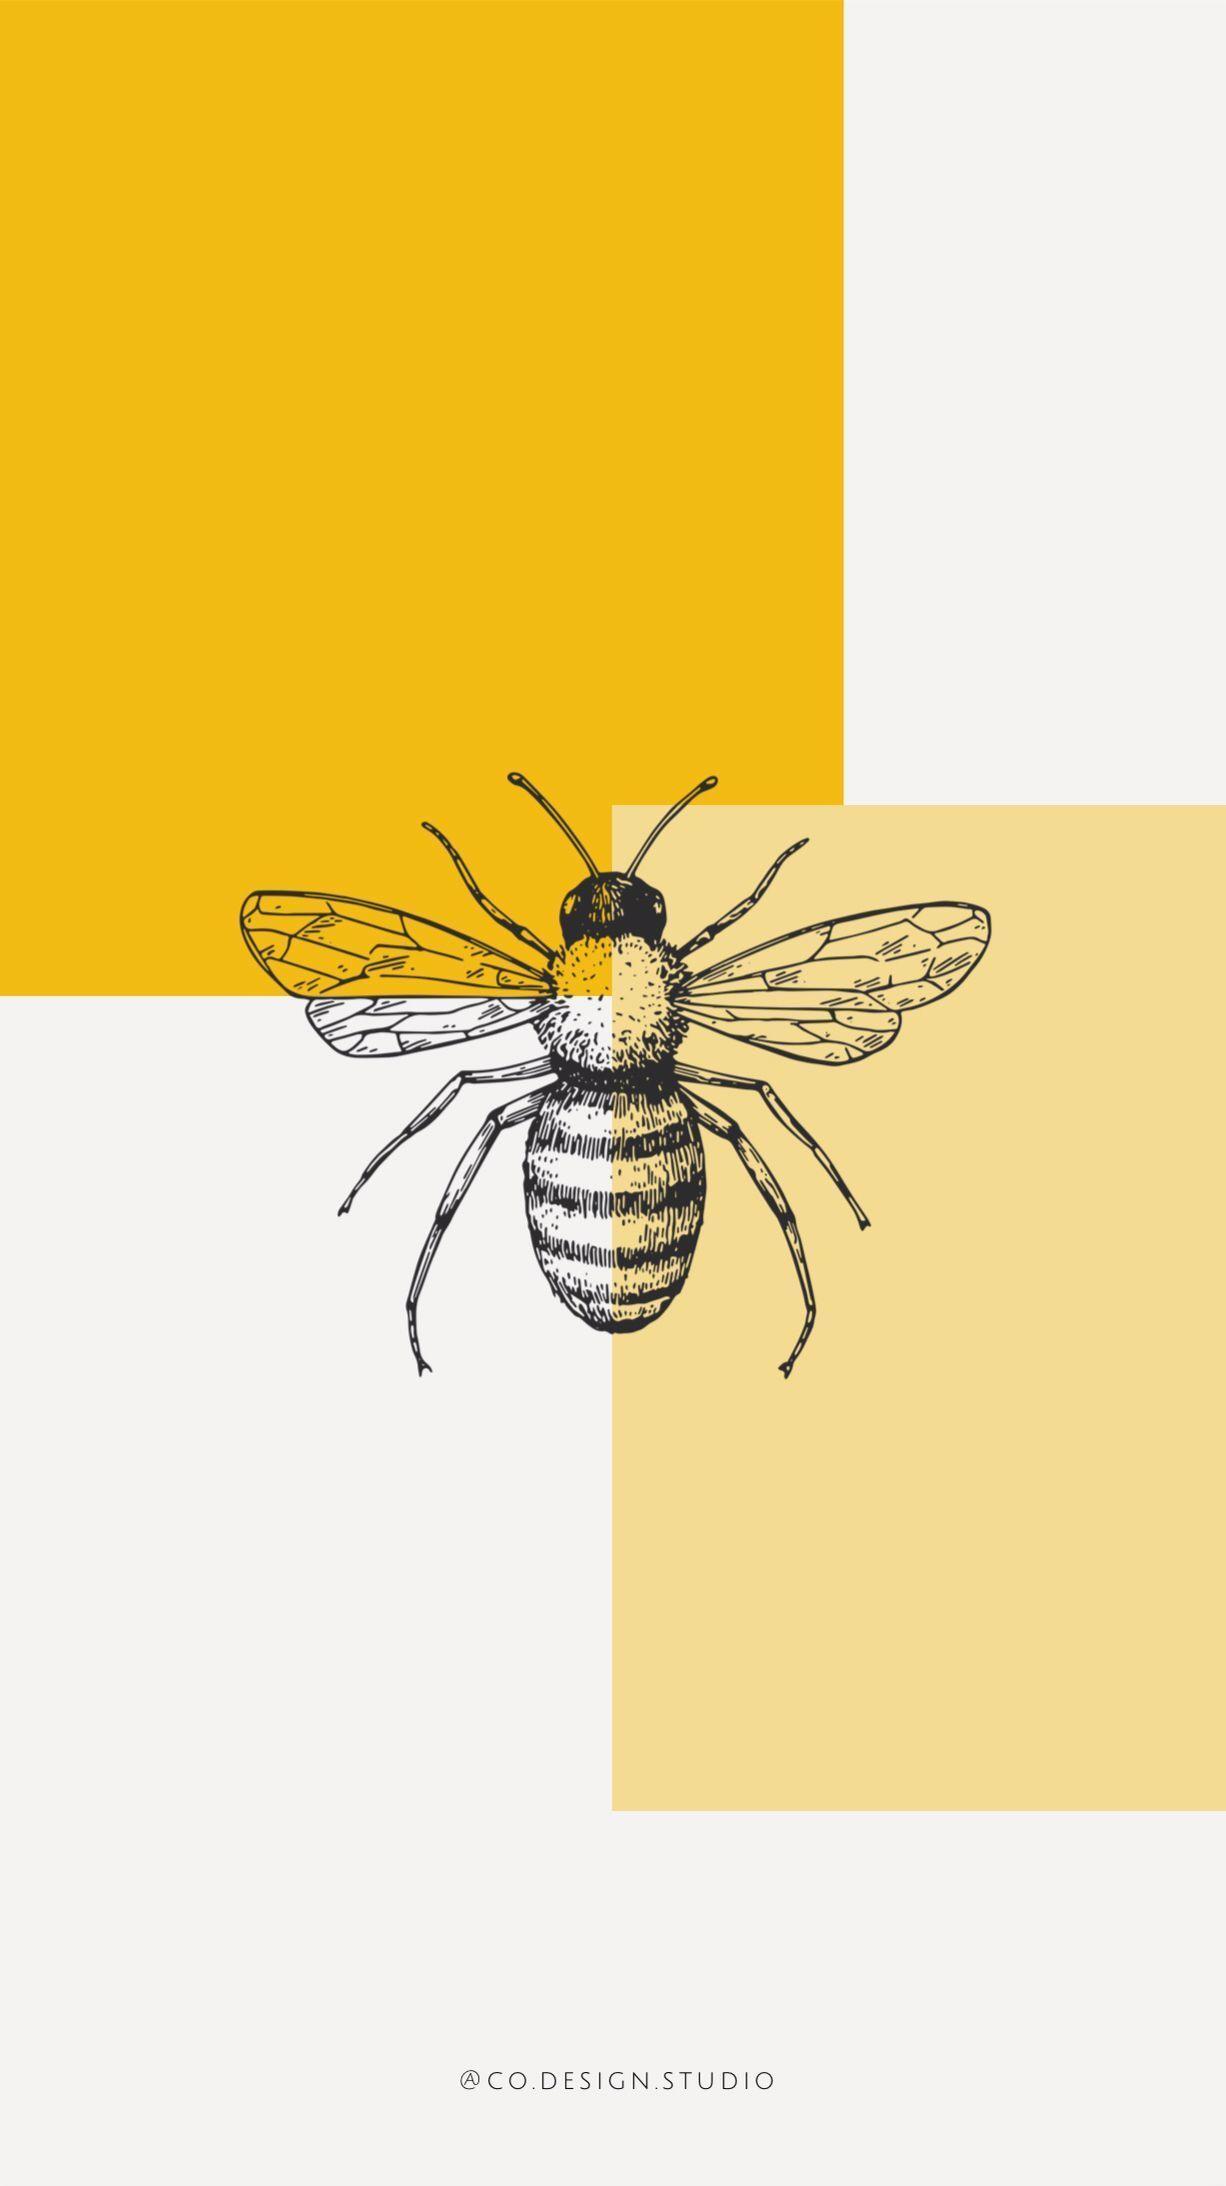 Papier Peint Iphone 2019 Graphicdesign Jaune Moutarde Bee Honey In 2020 Yellow Wallpaper Yellow Aesthetic Aesthetic Wallpapers